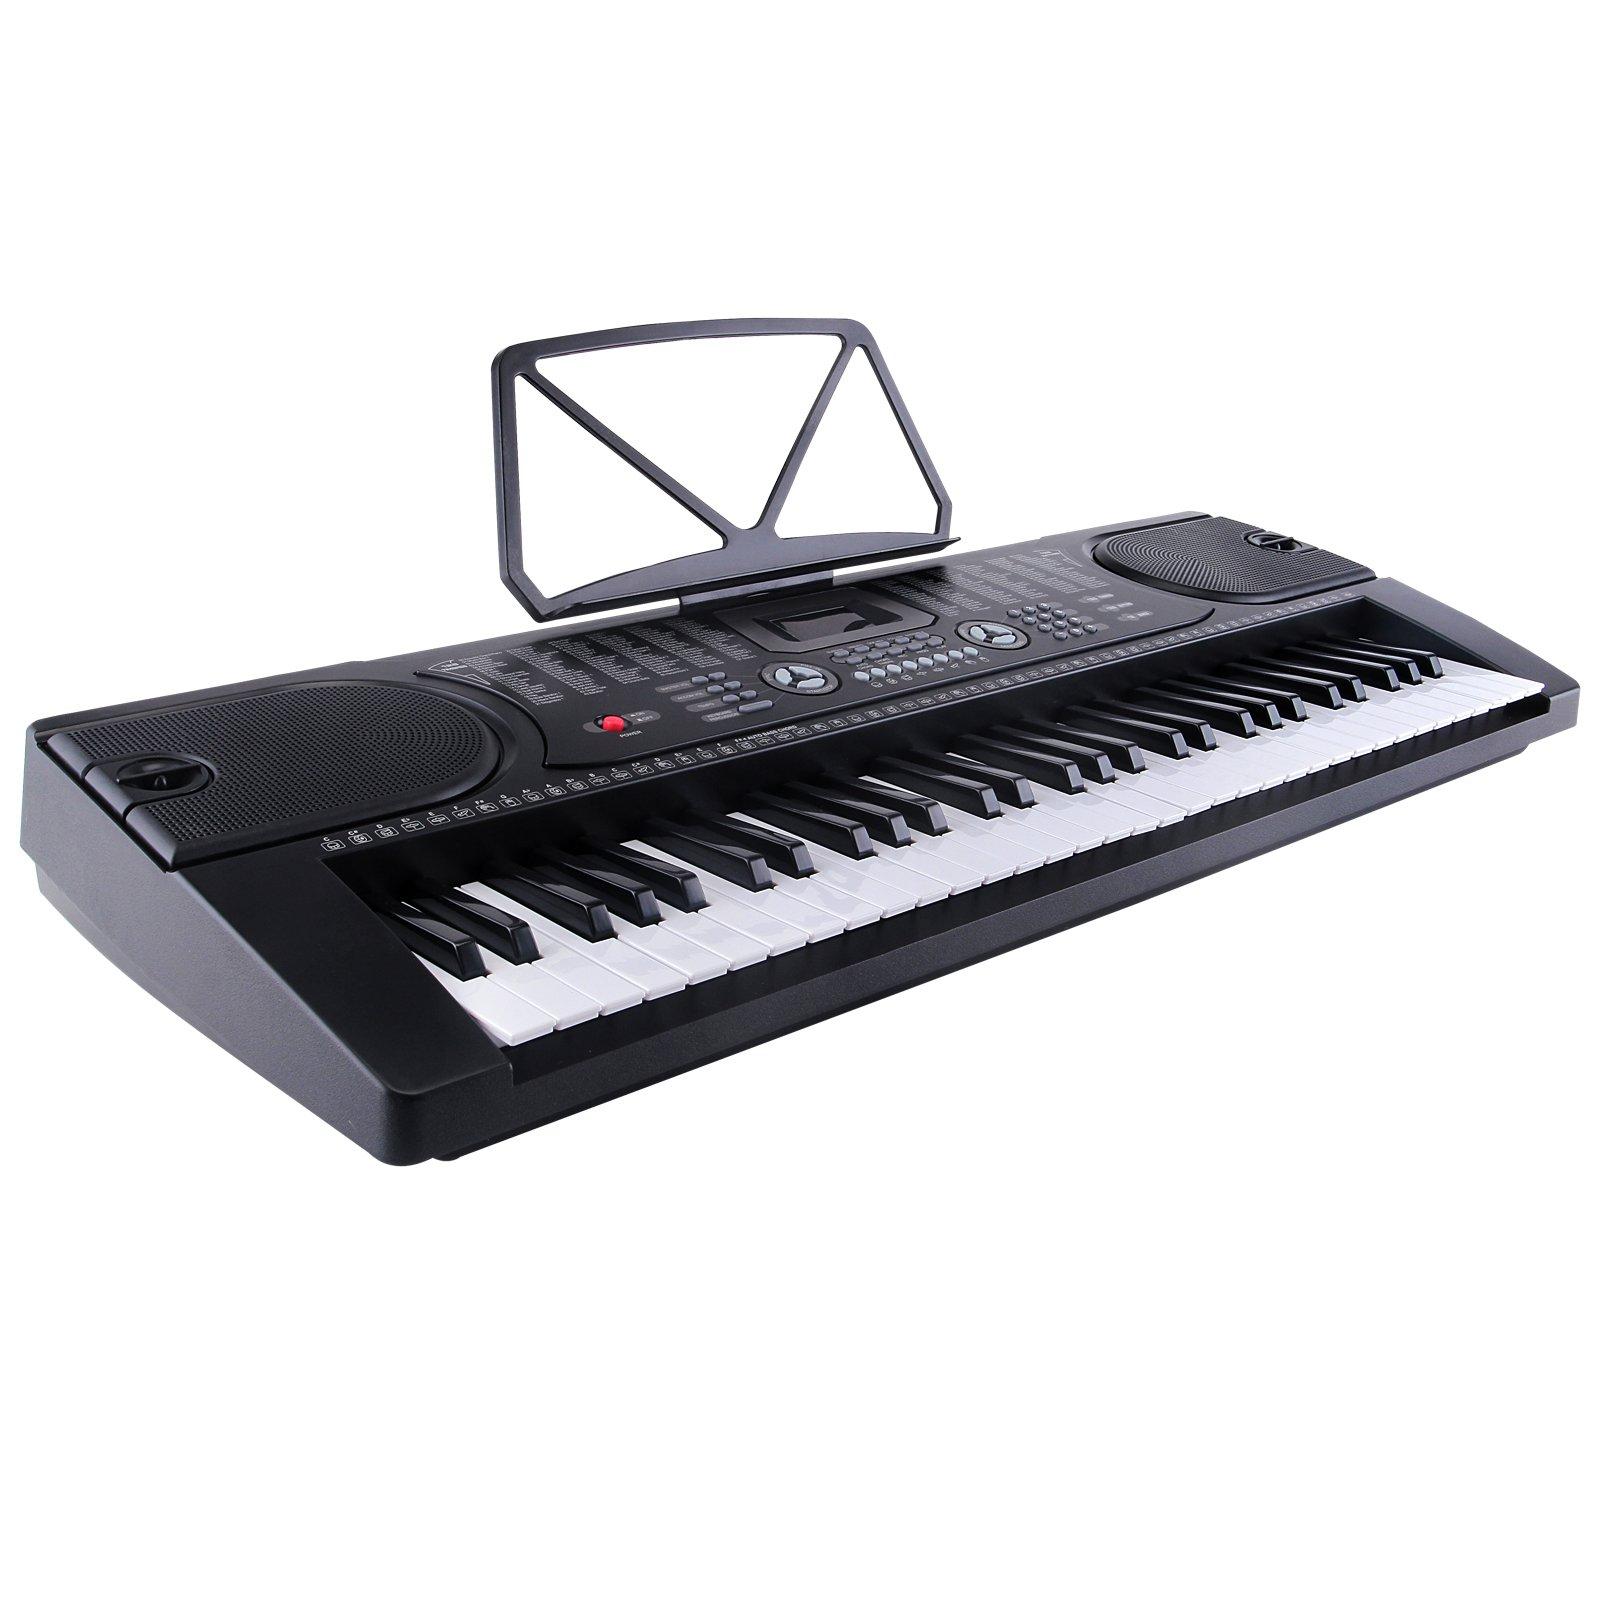 LAGRIMA Electric Piano Keyboard 61 key Keyboard Music Piano Portable Electronic Digital paino with Microphone (Black)